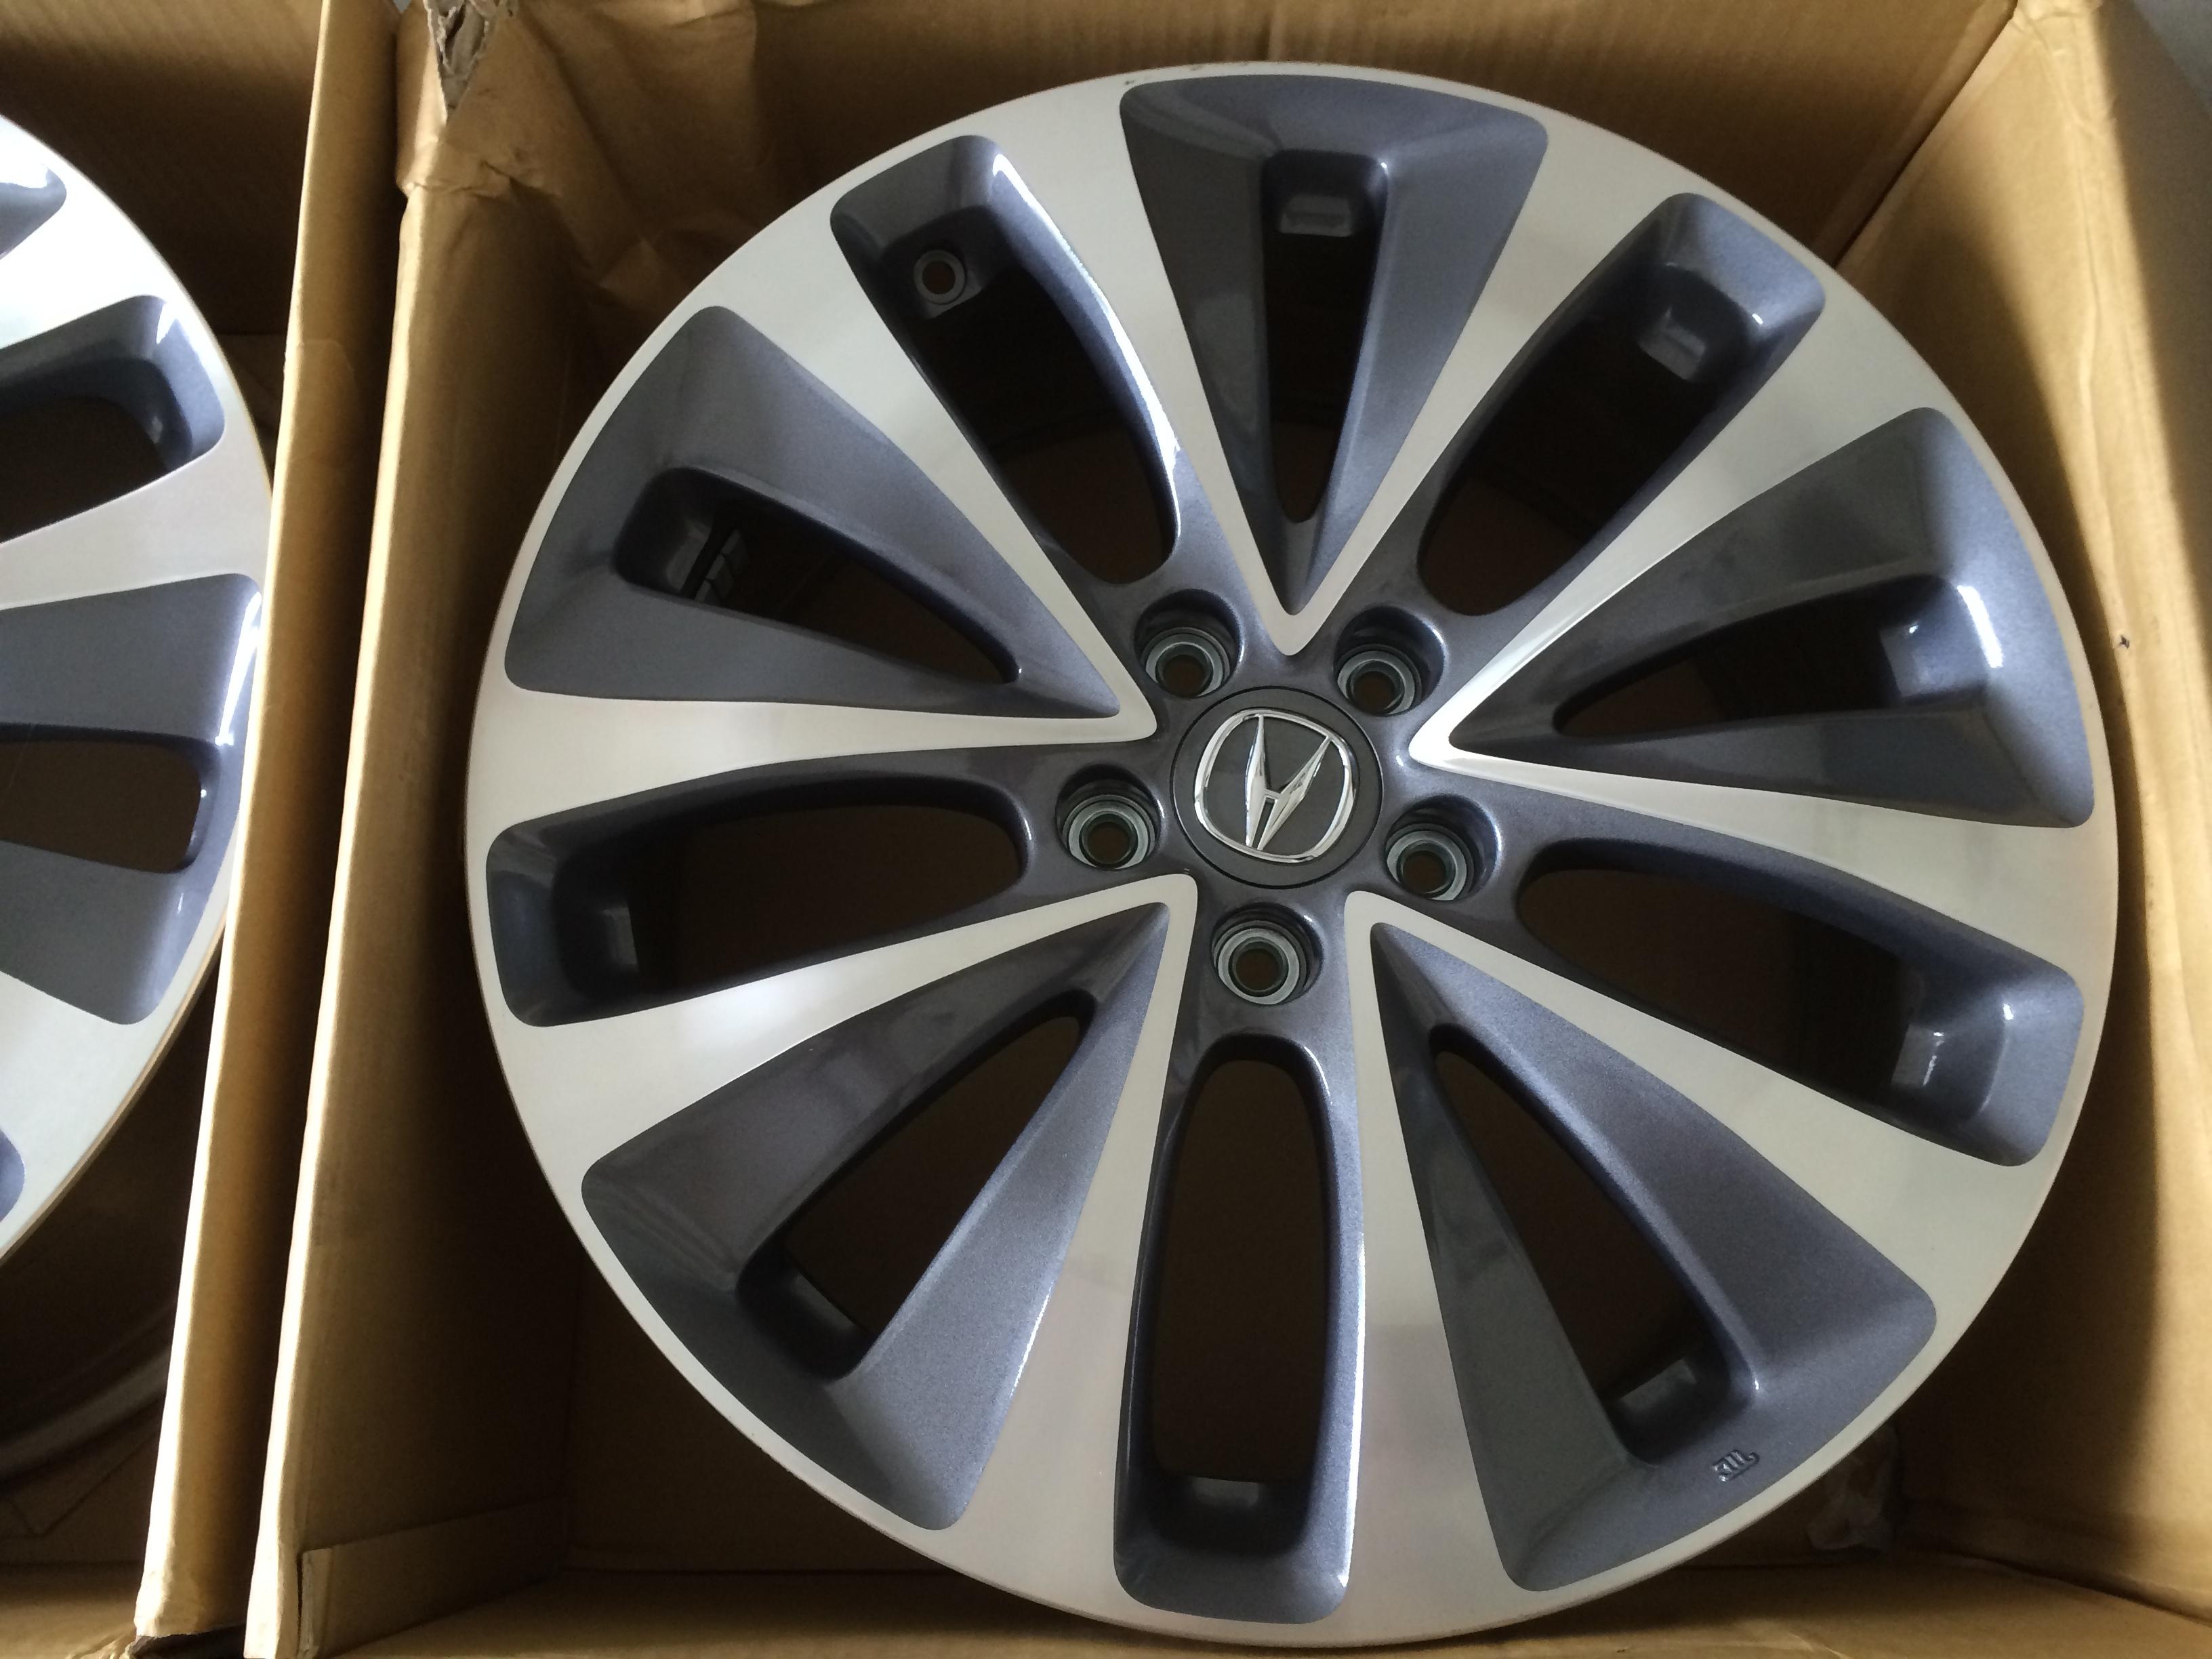 Acura MDX OEM Wheels Acura MDX Forum Acura MDX SUV Forums - Acura oem wheels